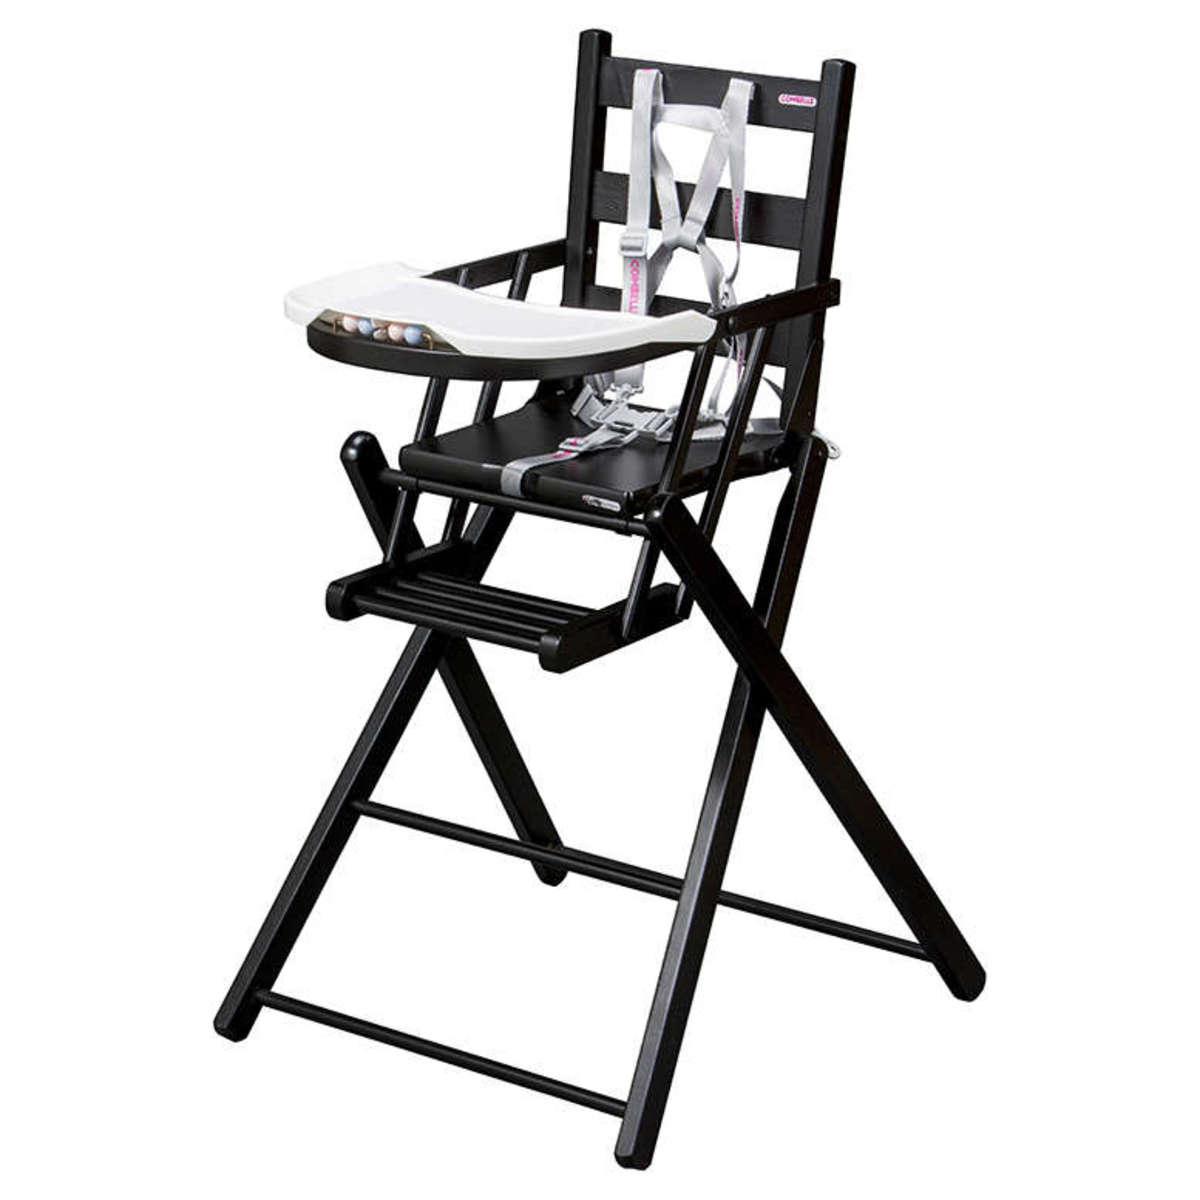 Chaise haute Chaise Haute Extra-Pliante Sarah - Noir Chaise Haute Extra-Pliante Sarah - Noir